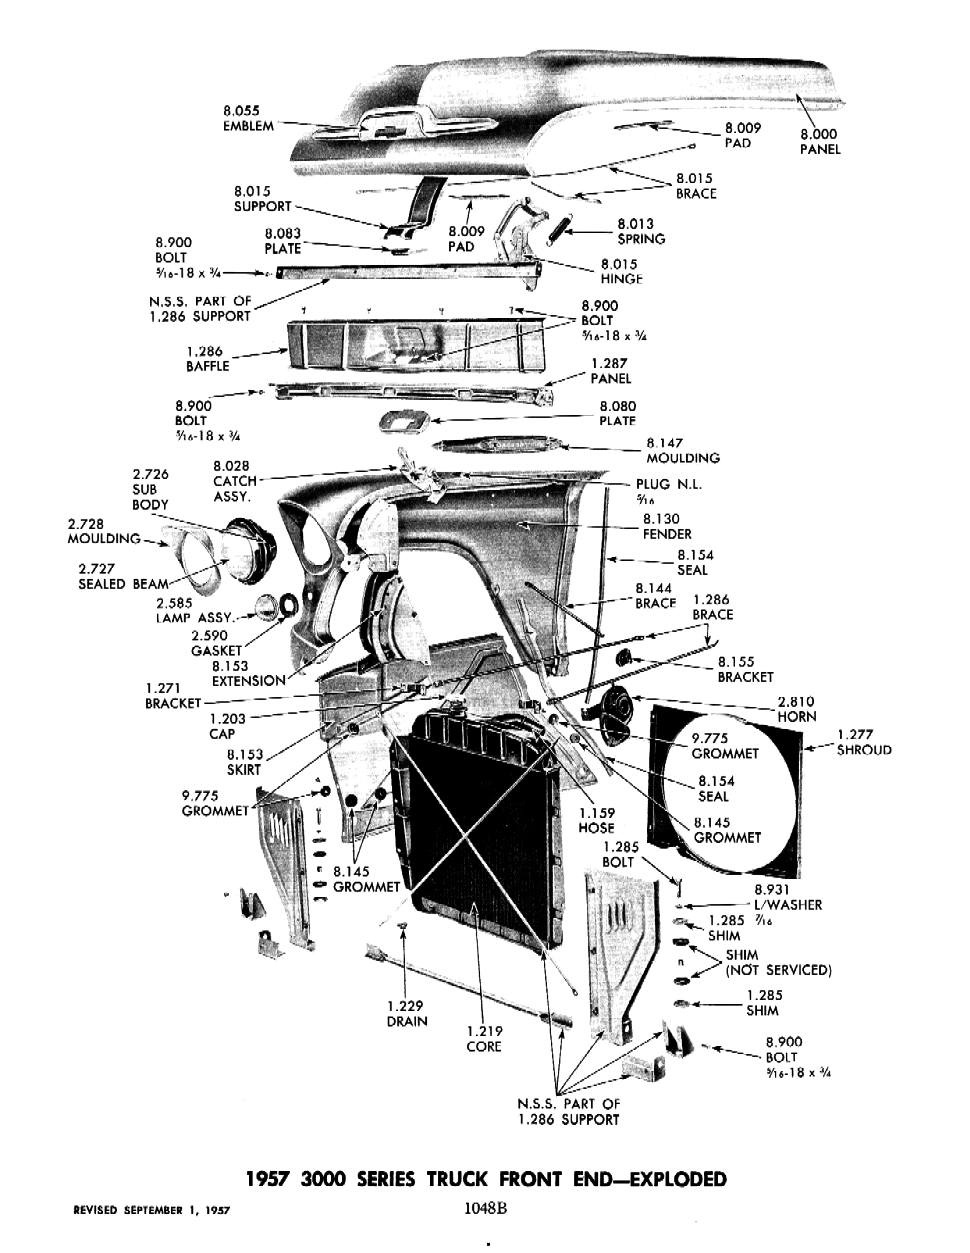 57 chevy vintage air parts